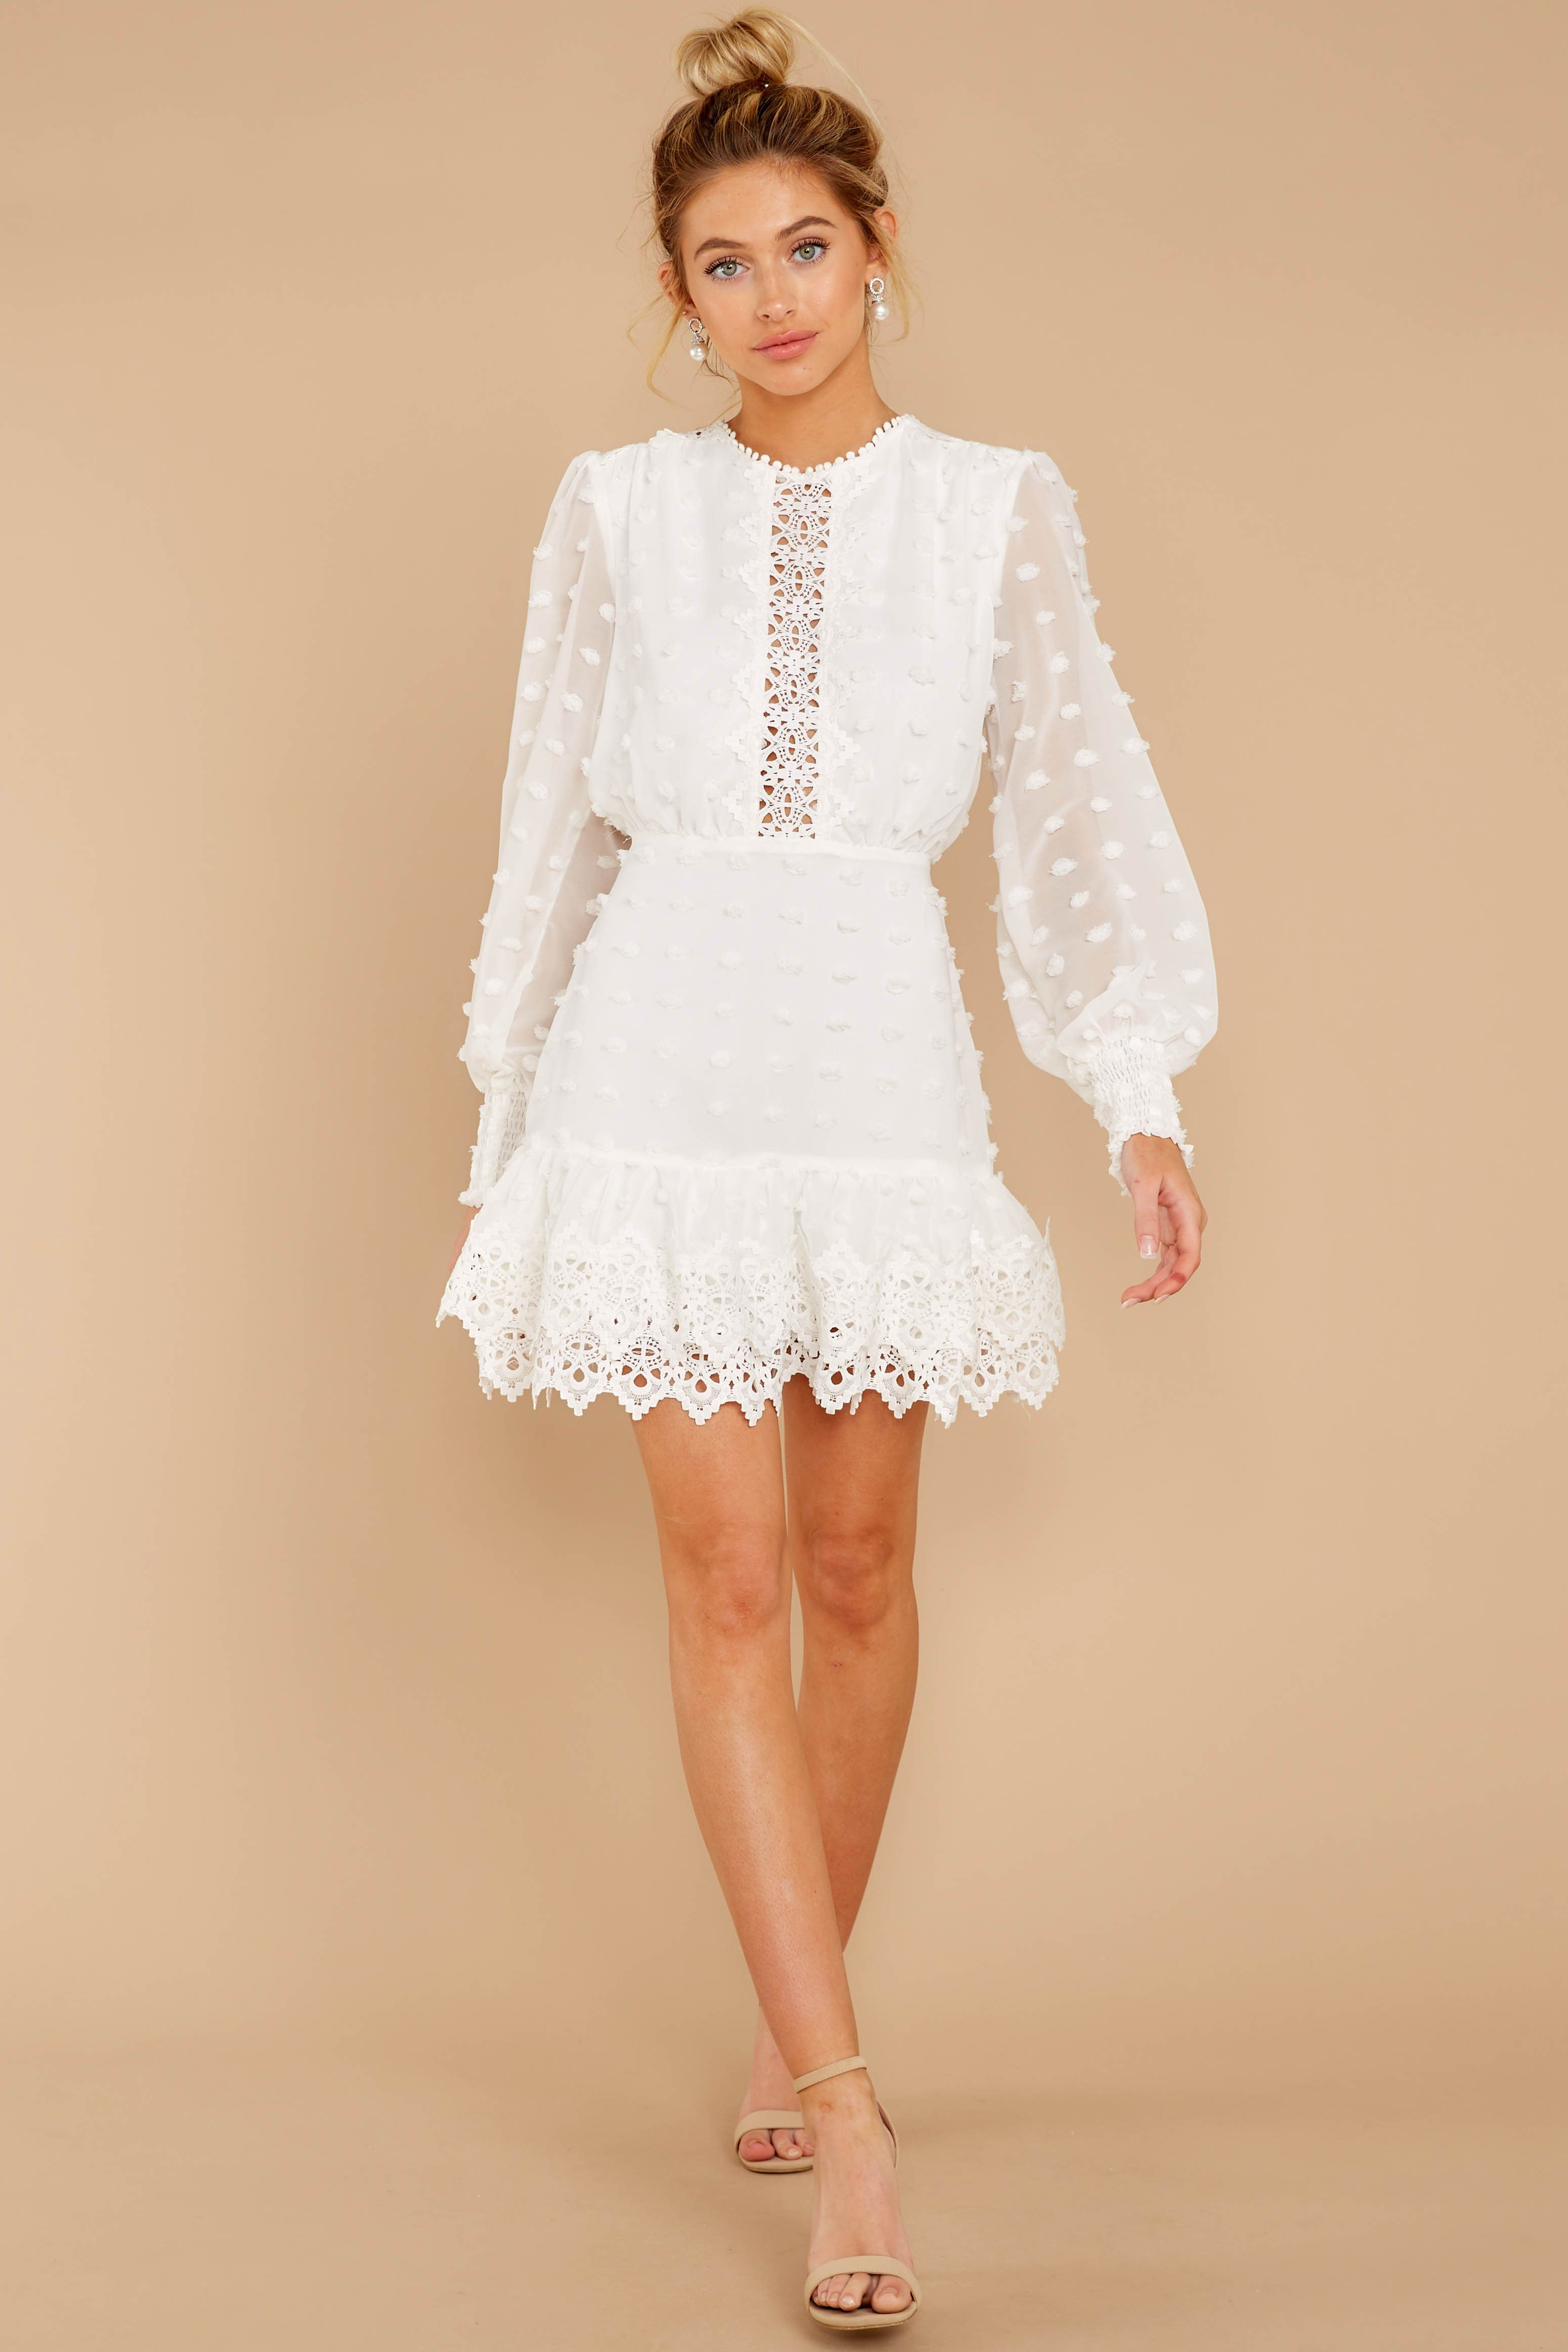 Stunning White Lace Dress Short Long Sleeve Dress Dress 54 00 Red Dress White Lace Dress Short Lace Dress Ethereal Lace Dress